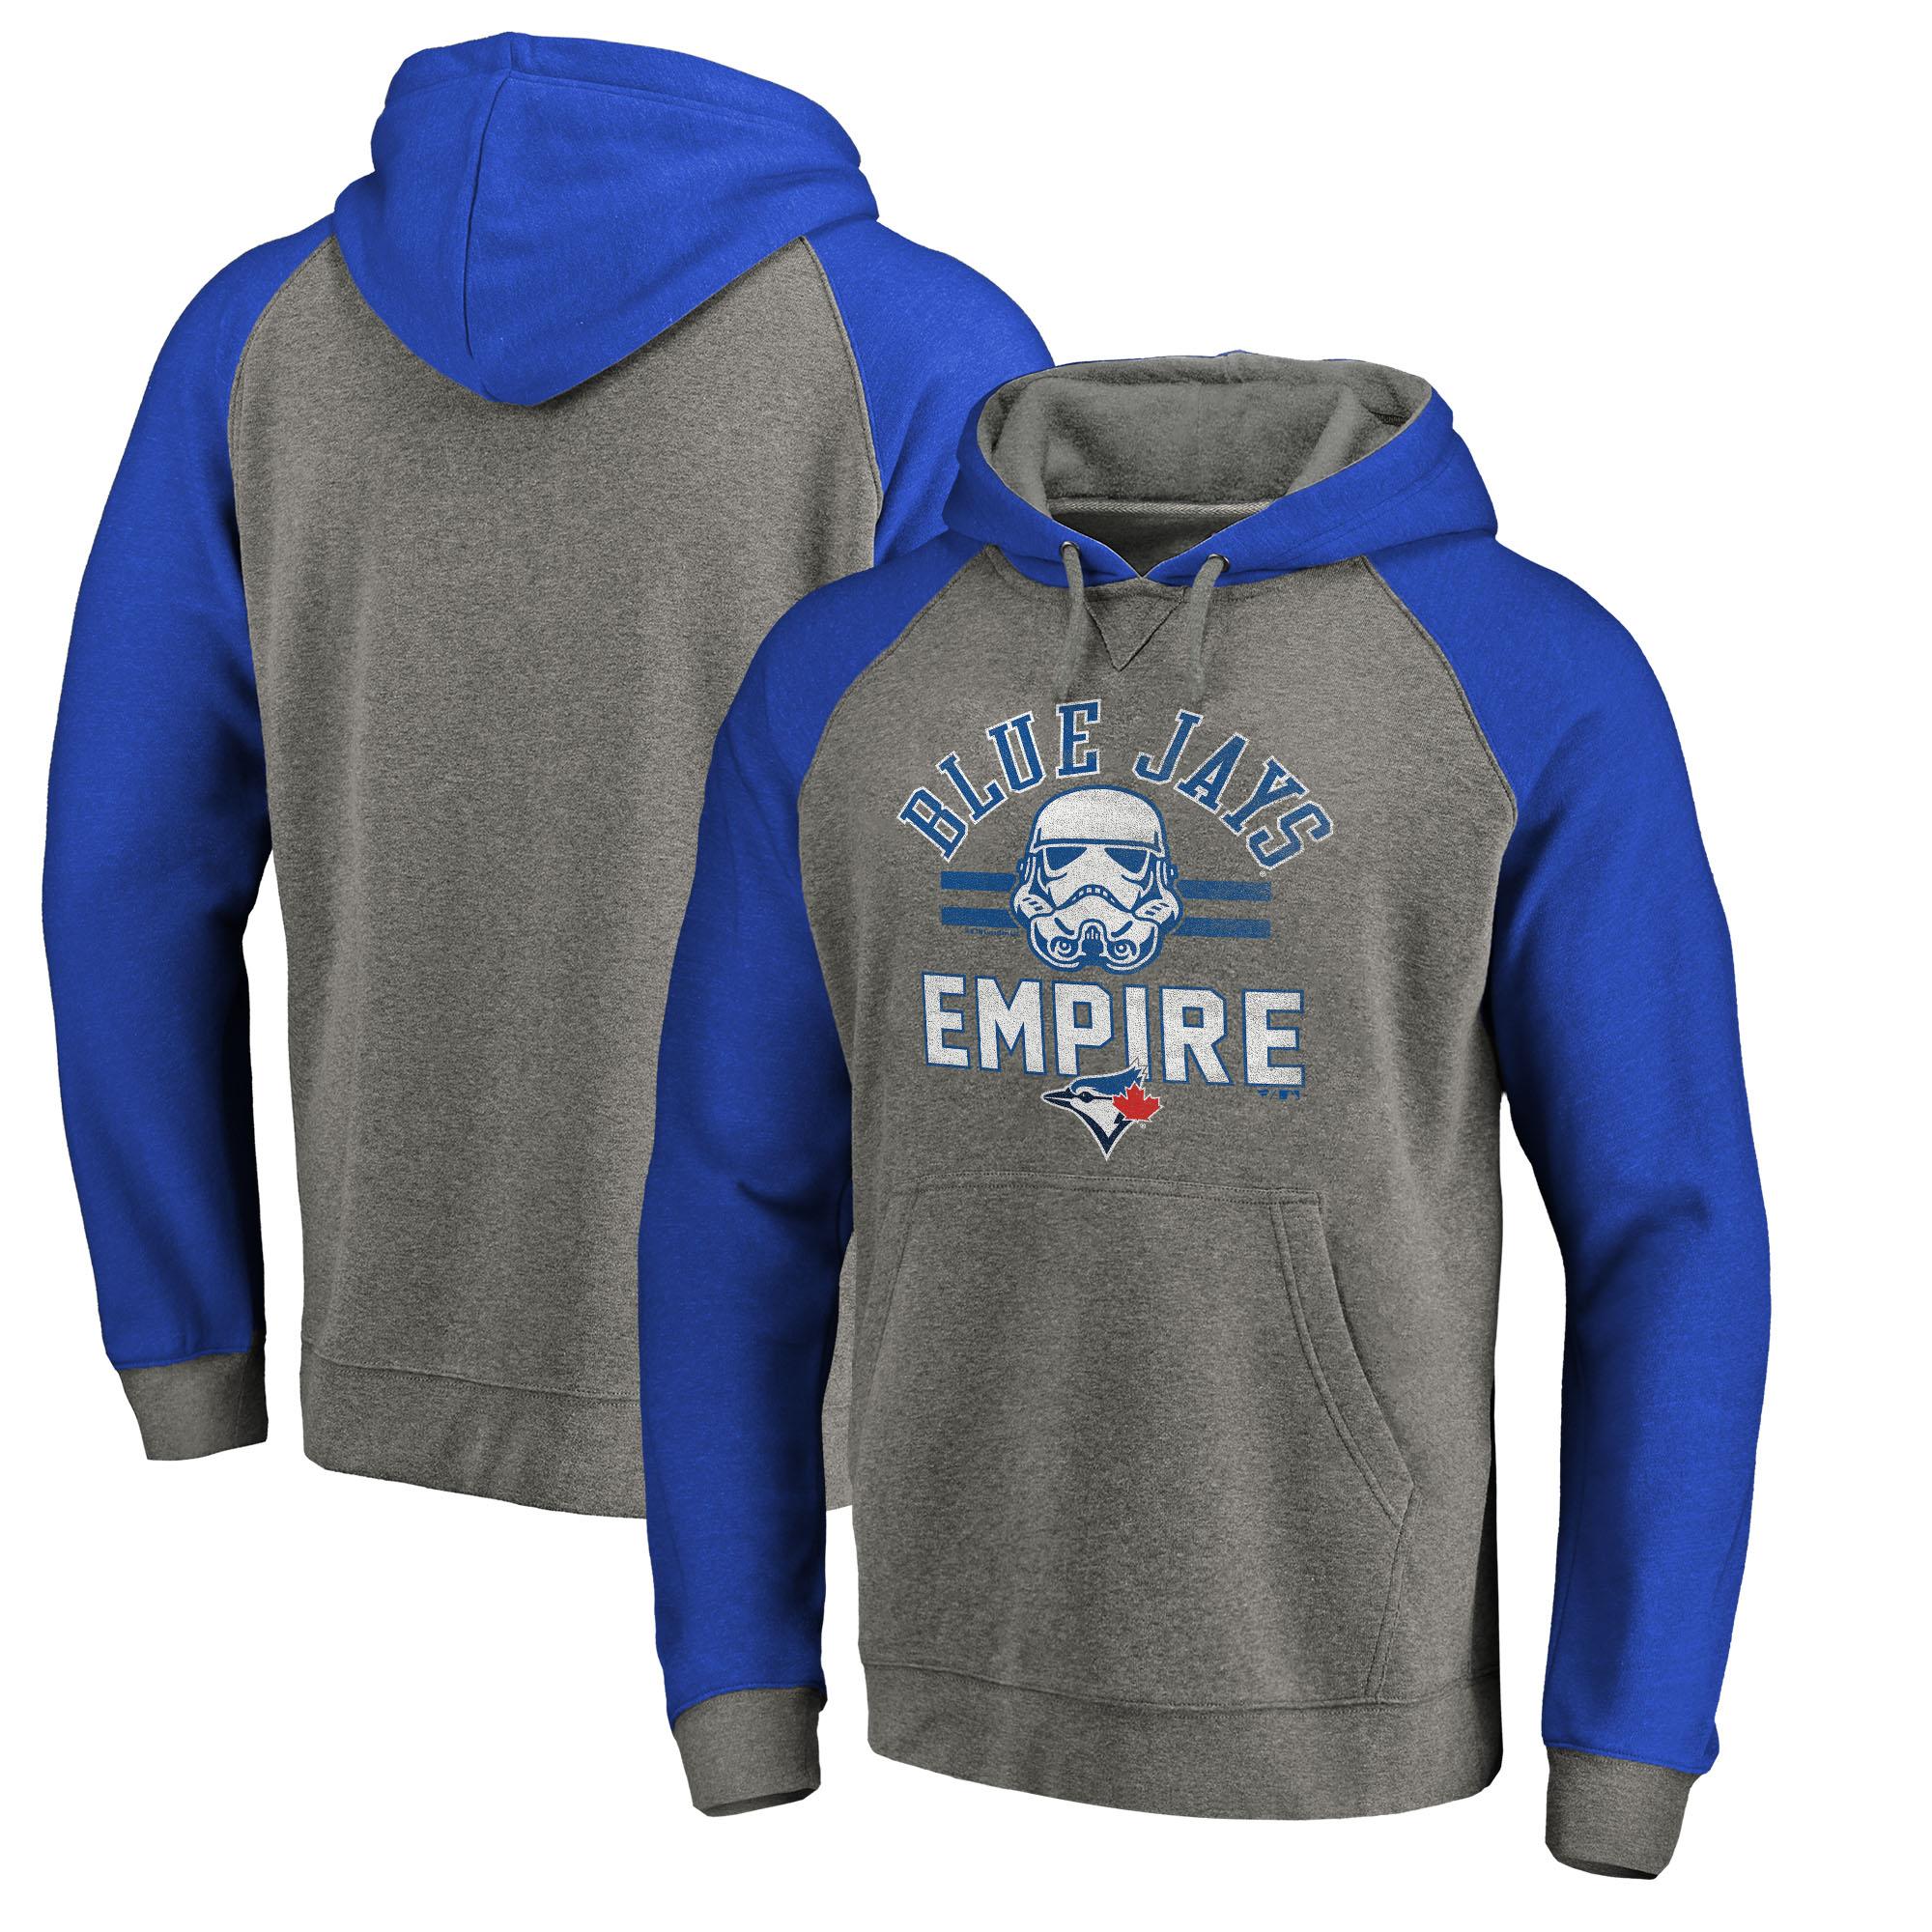 Toronto Blue Jays Fanatics Branded MLB Star Wars Empire Tri-Blend Pullover Hoodie - Heather Gray